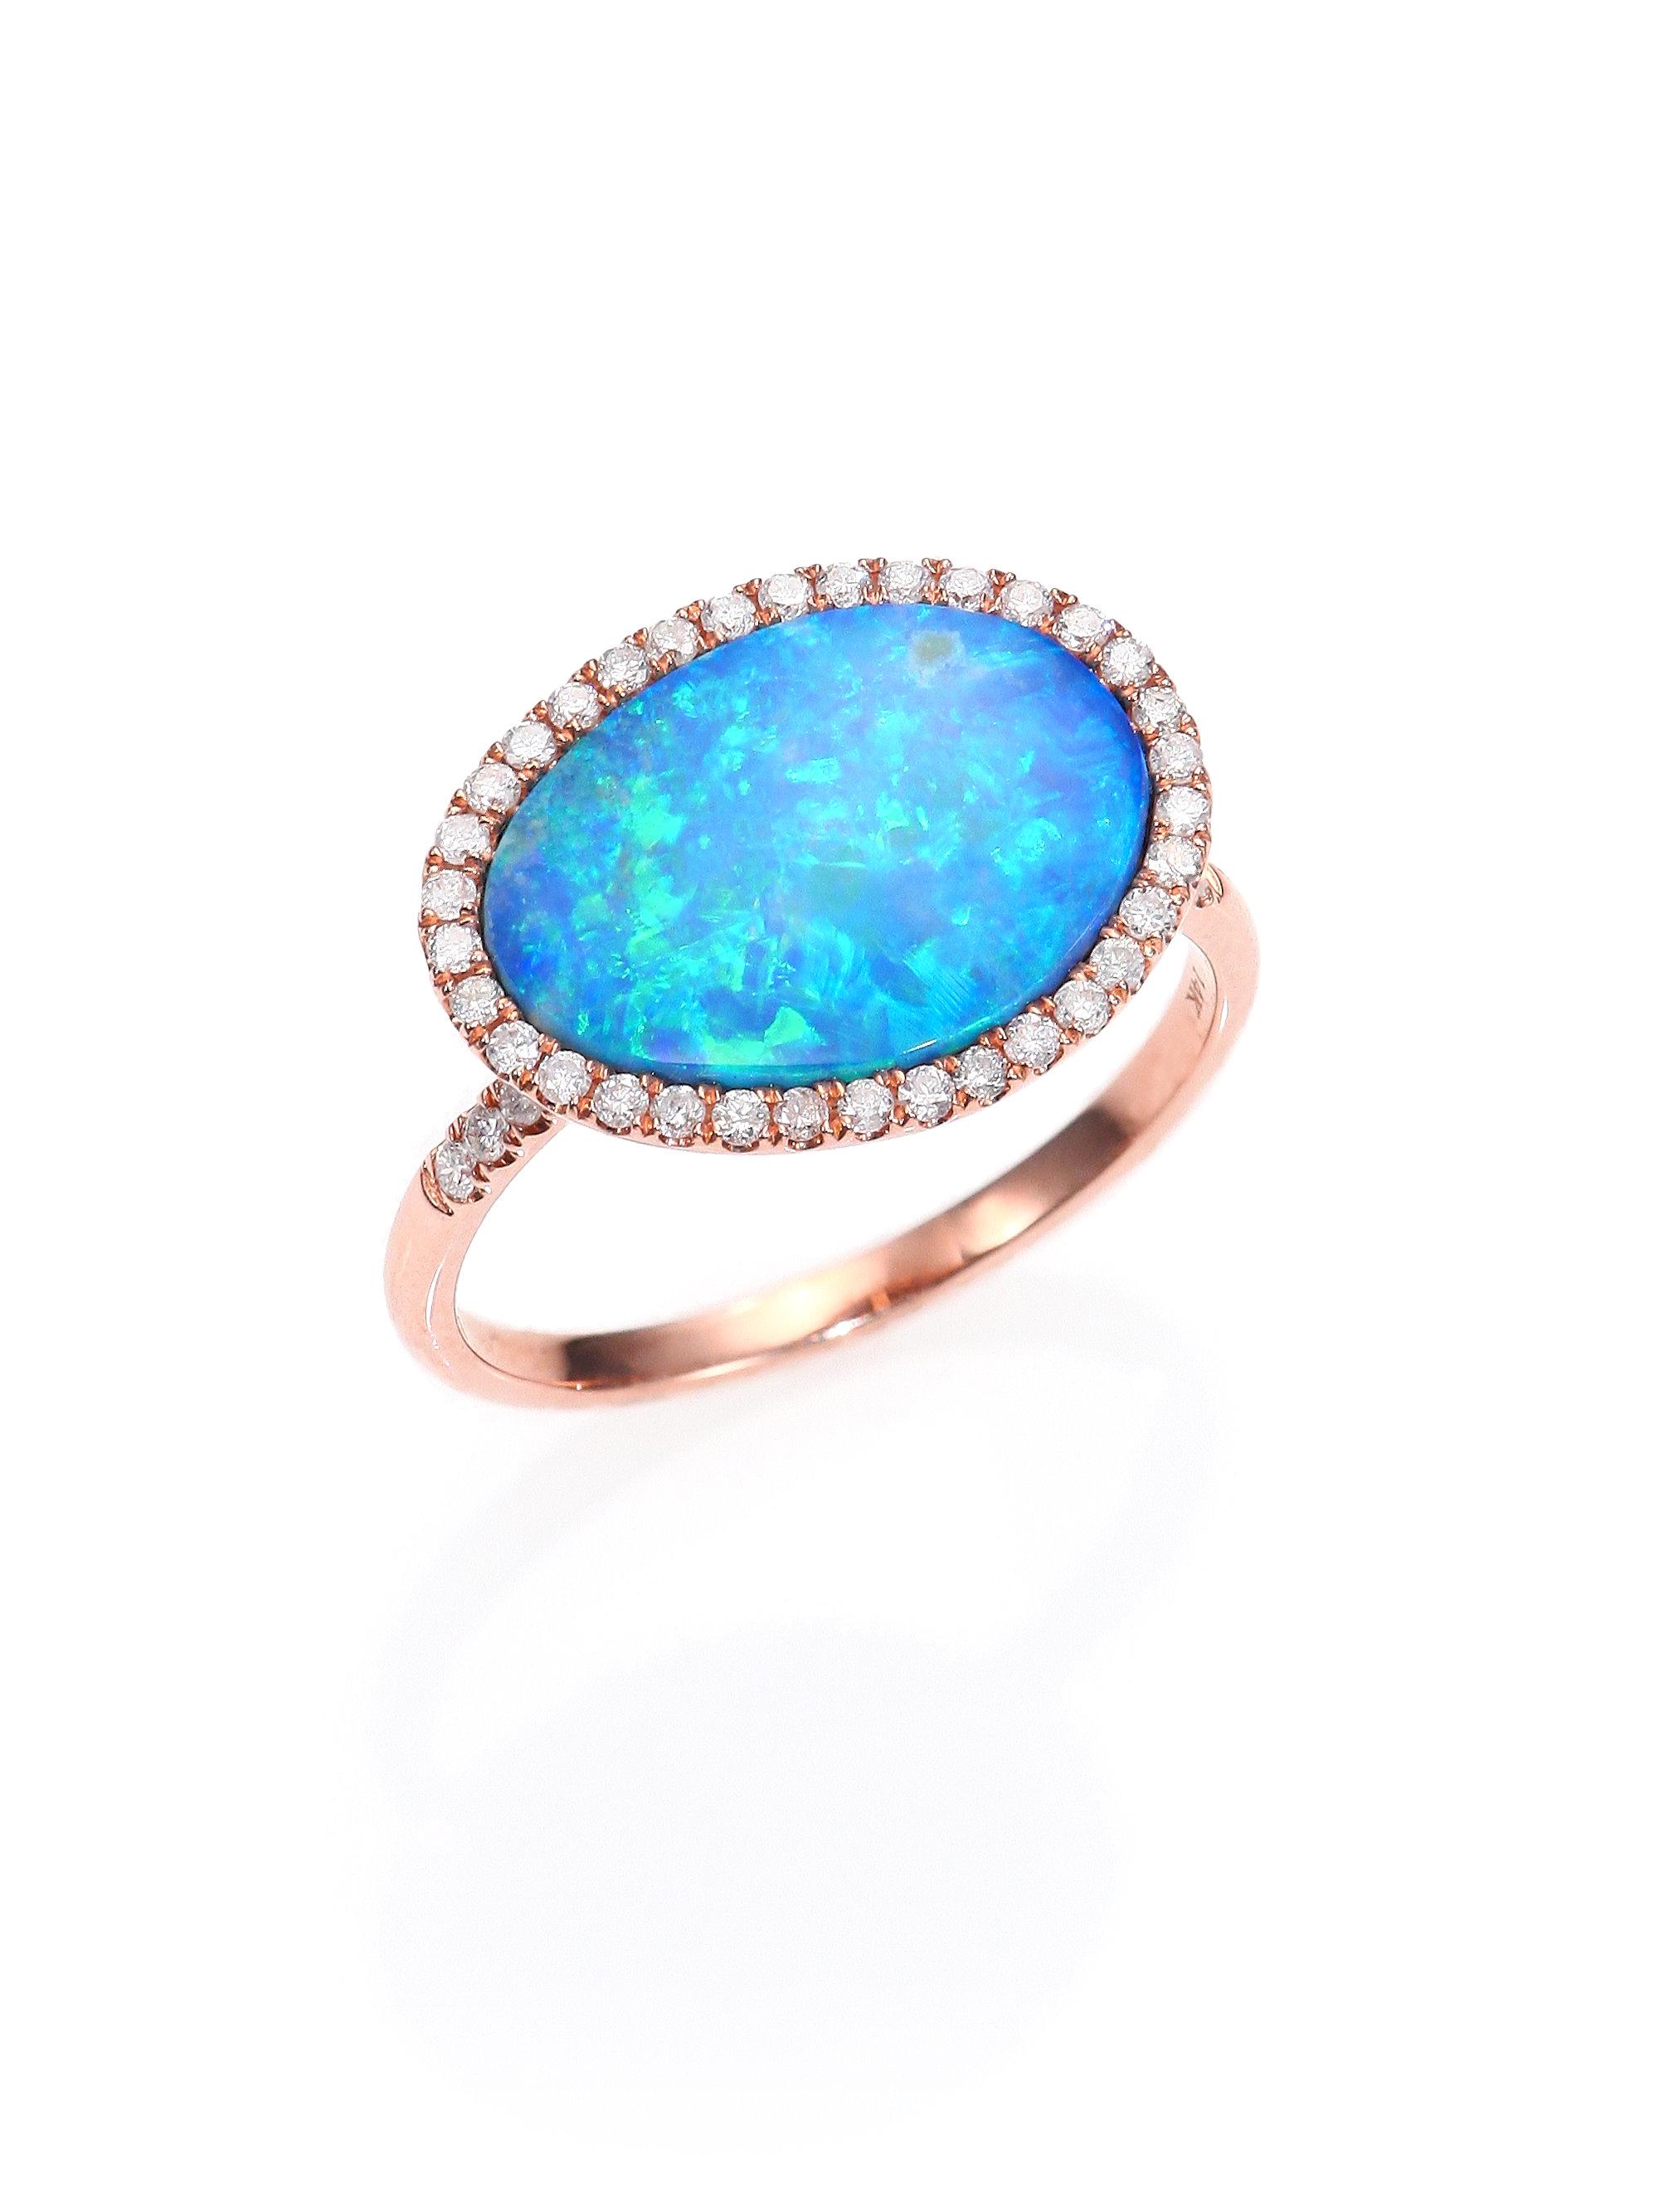 Meira t Opal, Diamond & 14k Rose Gold Ring in Pink (rose